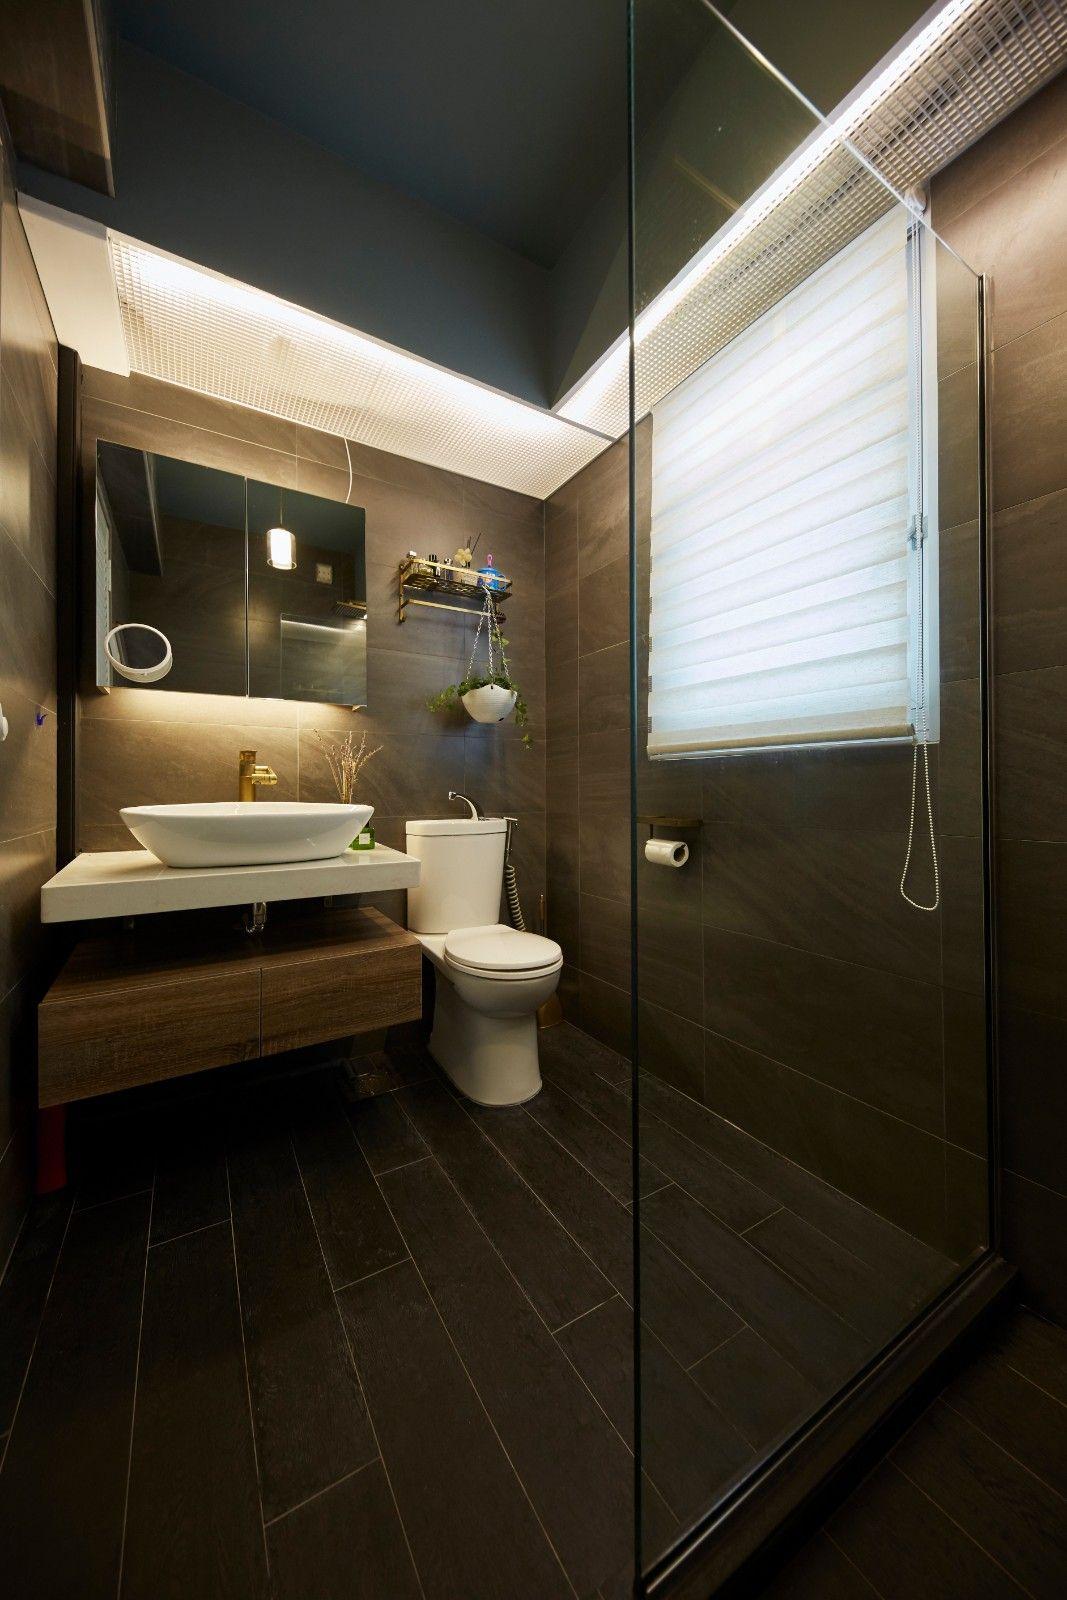 Modern Hdb Decor: HDB BTO Anchorvale Rustic Eclectic Theme 4 Room BTO